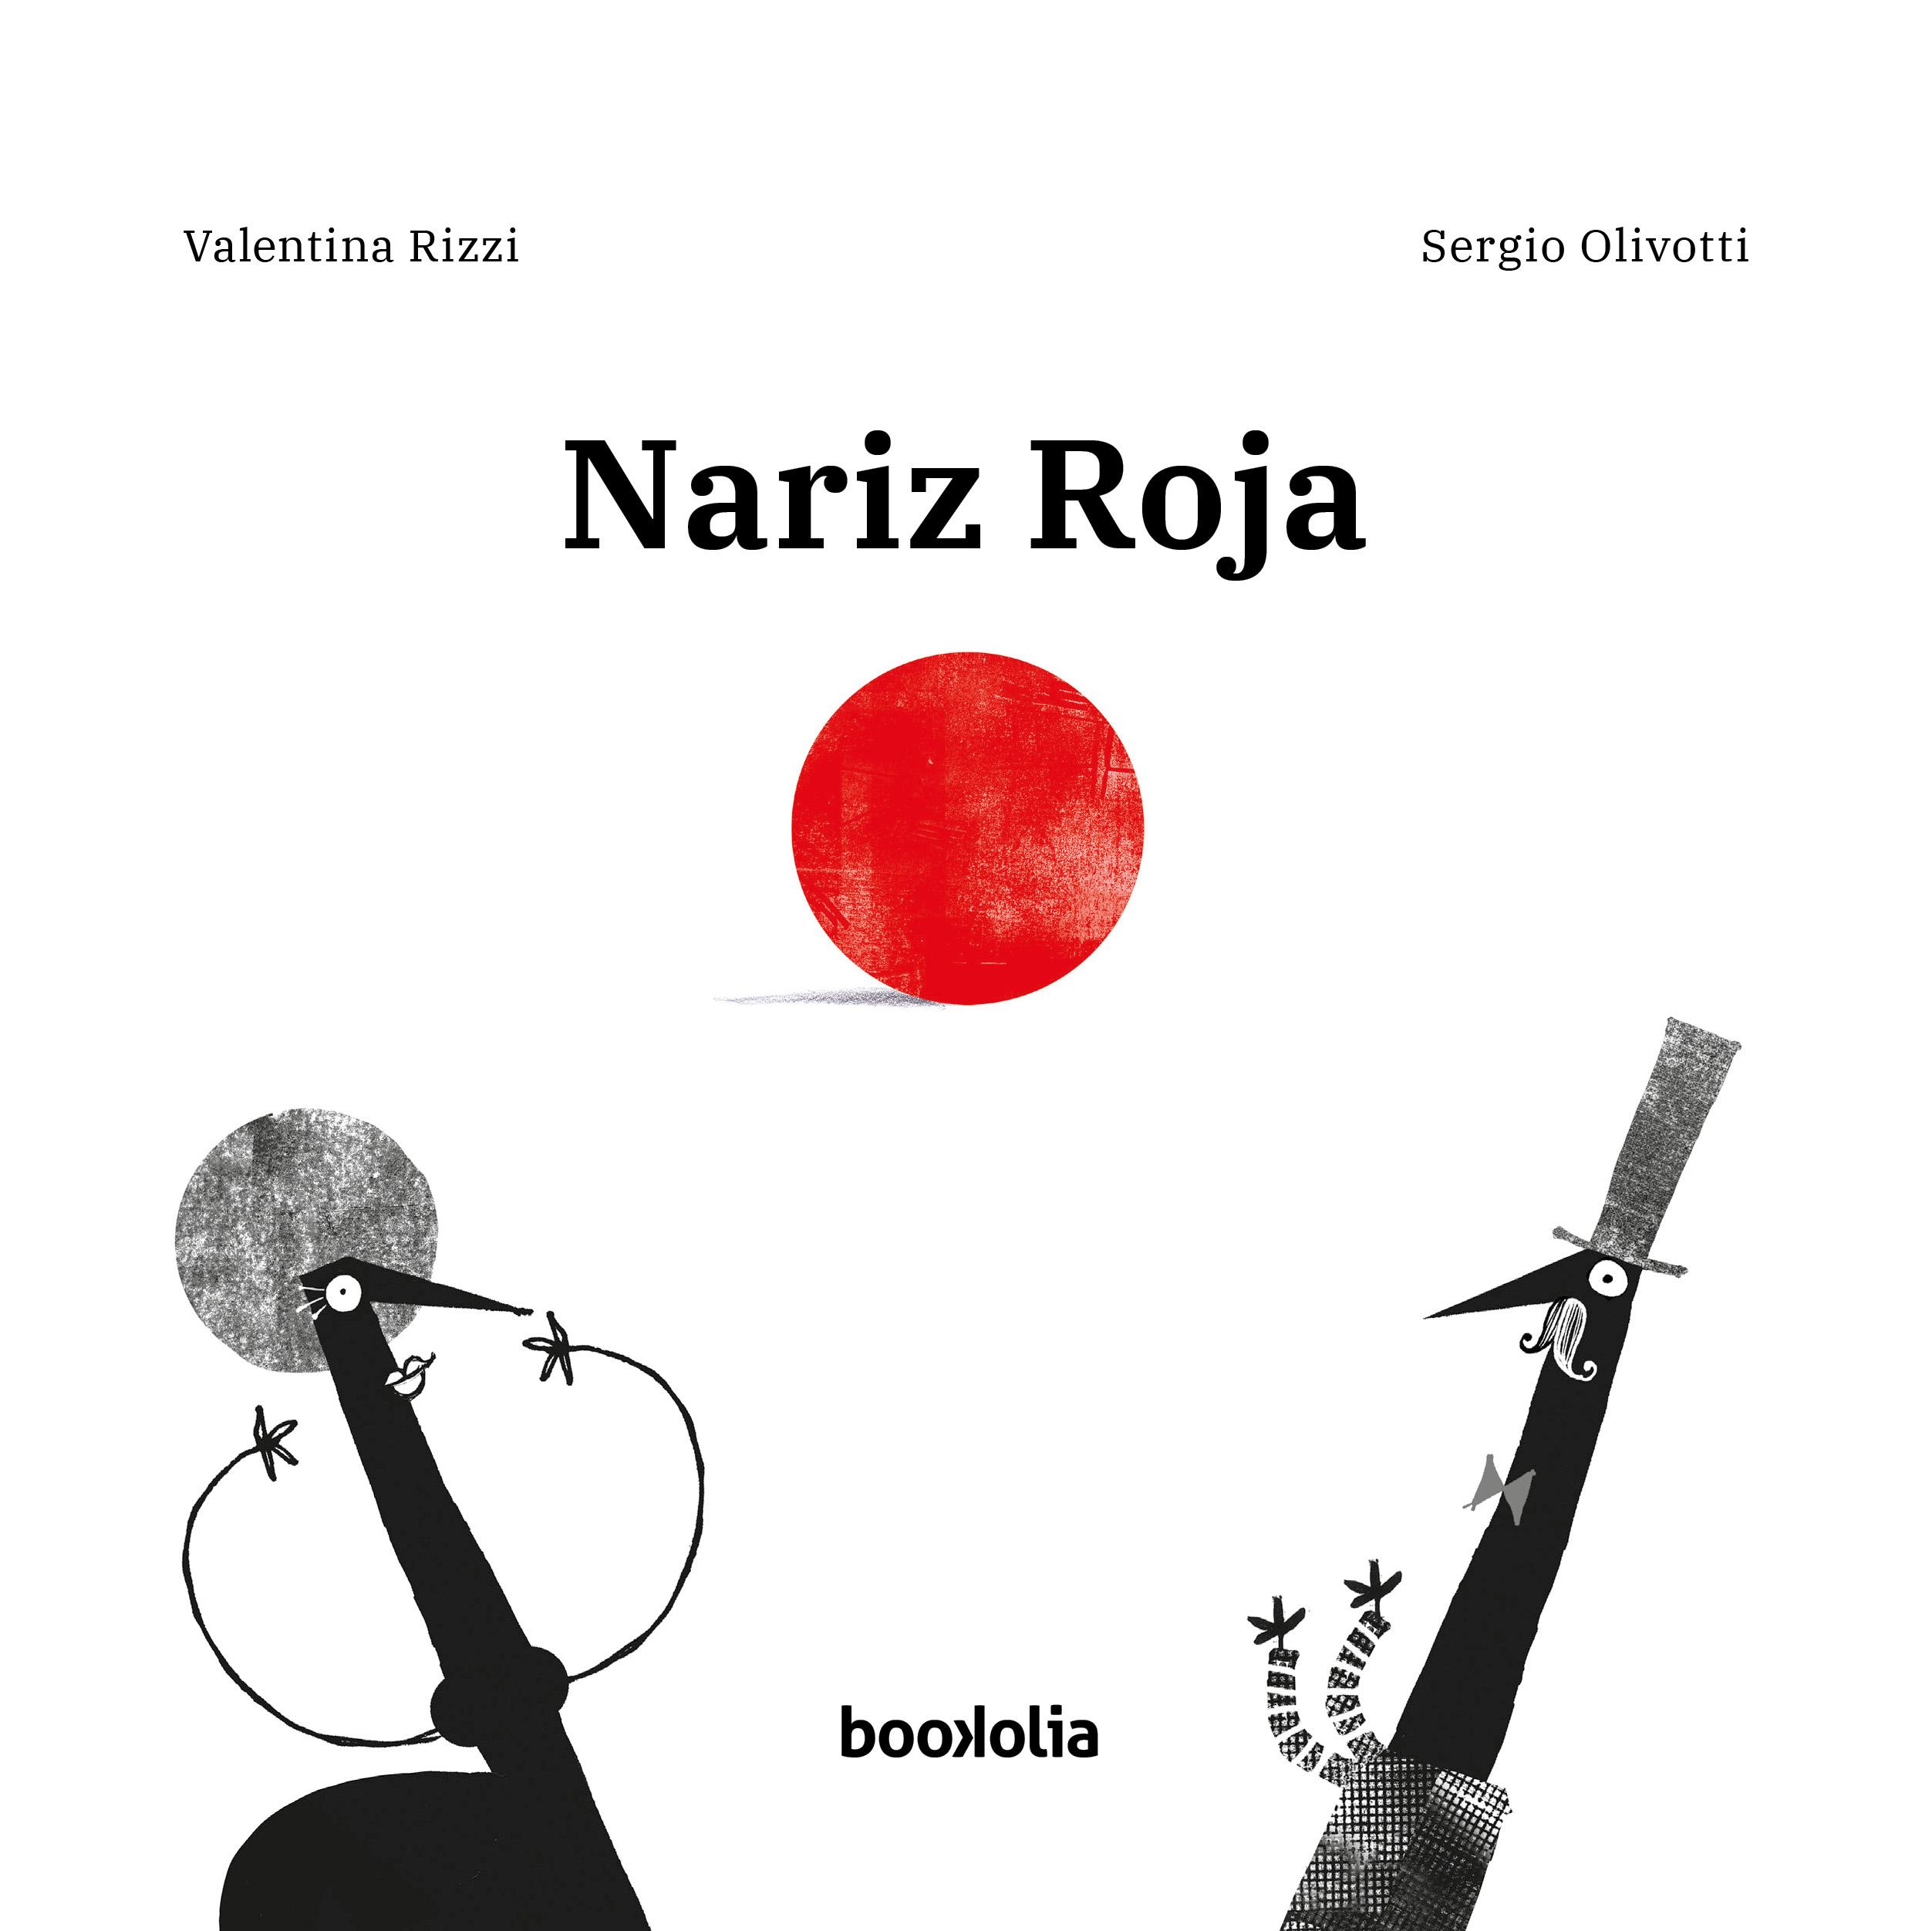 Nariz roja - Libros infantiles para regalar en Reyes